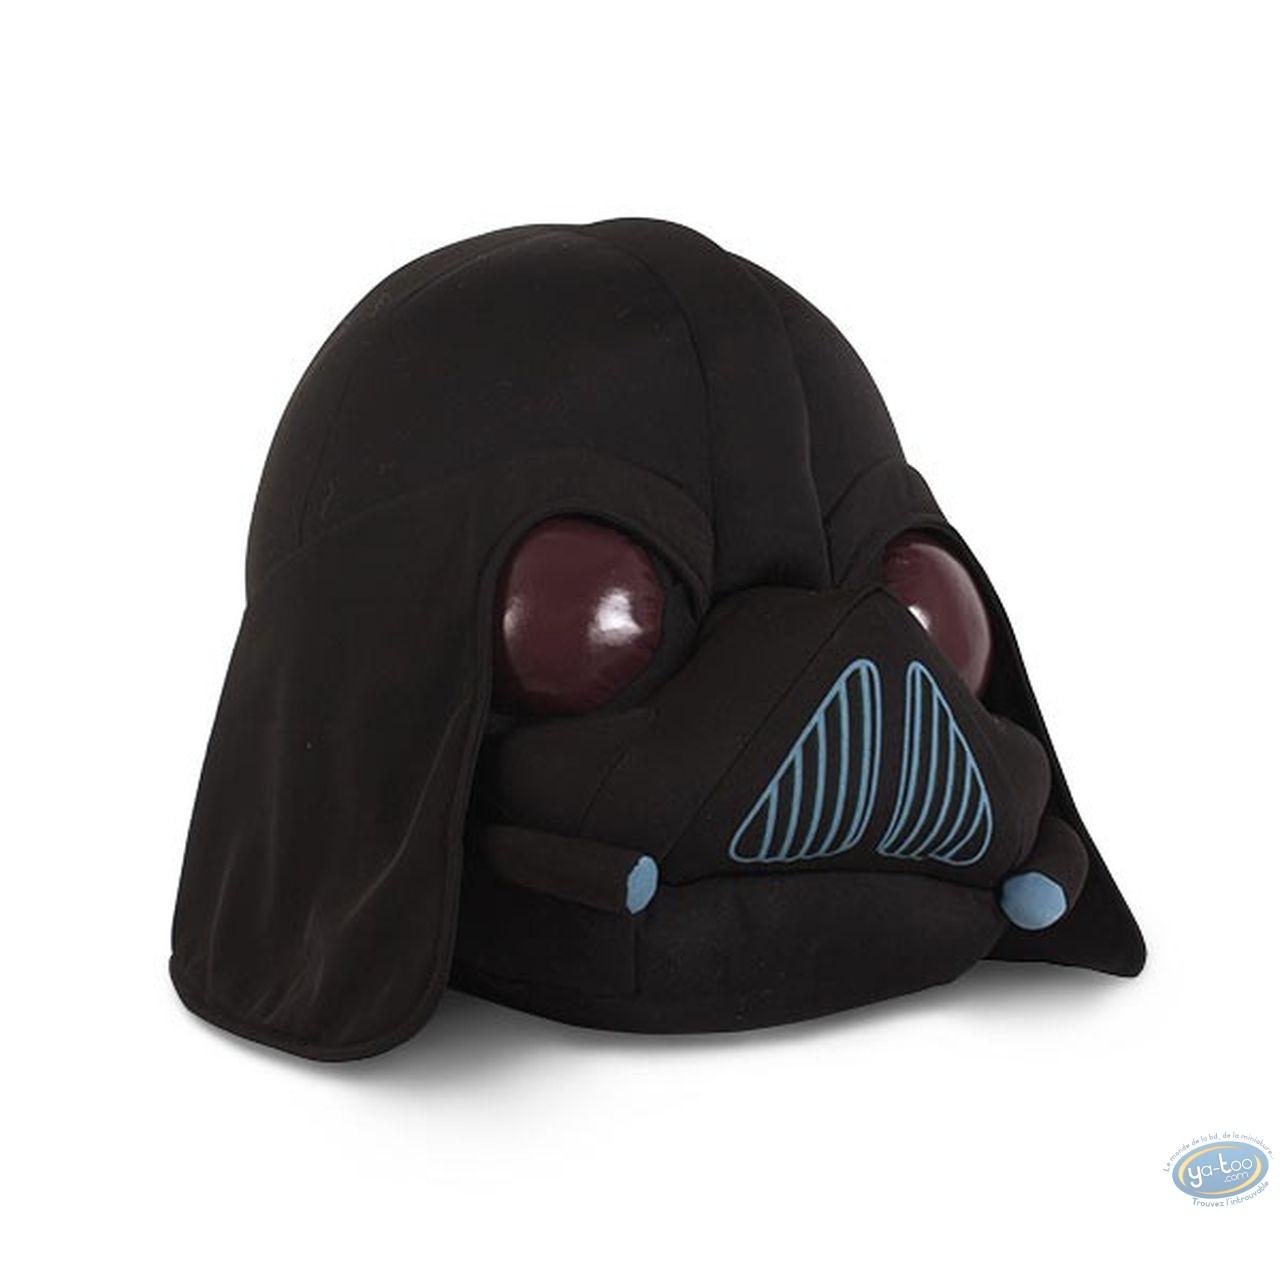 Peluche, Angry-birds : Darth Vader - Star Wars